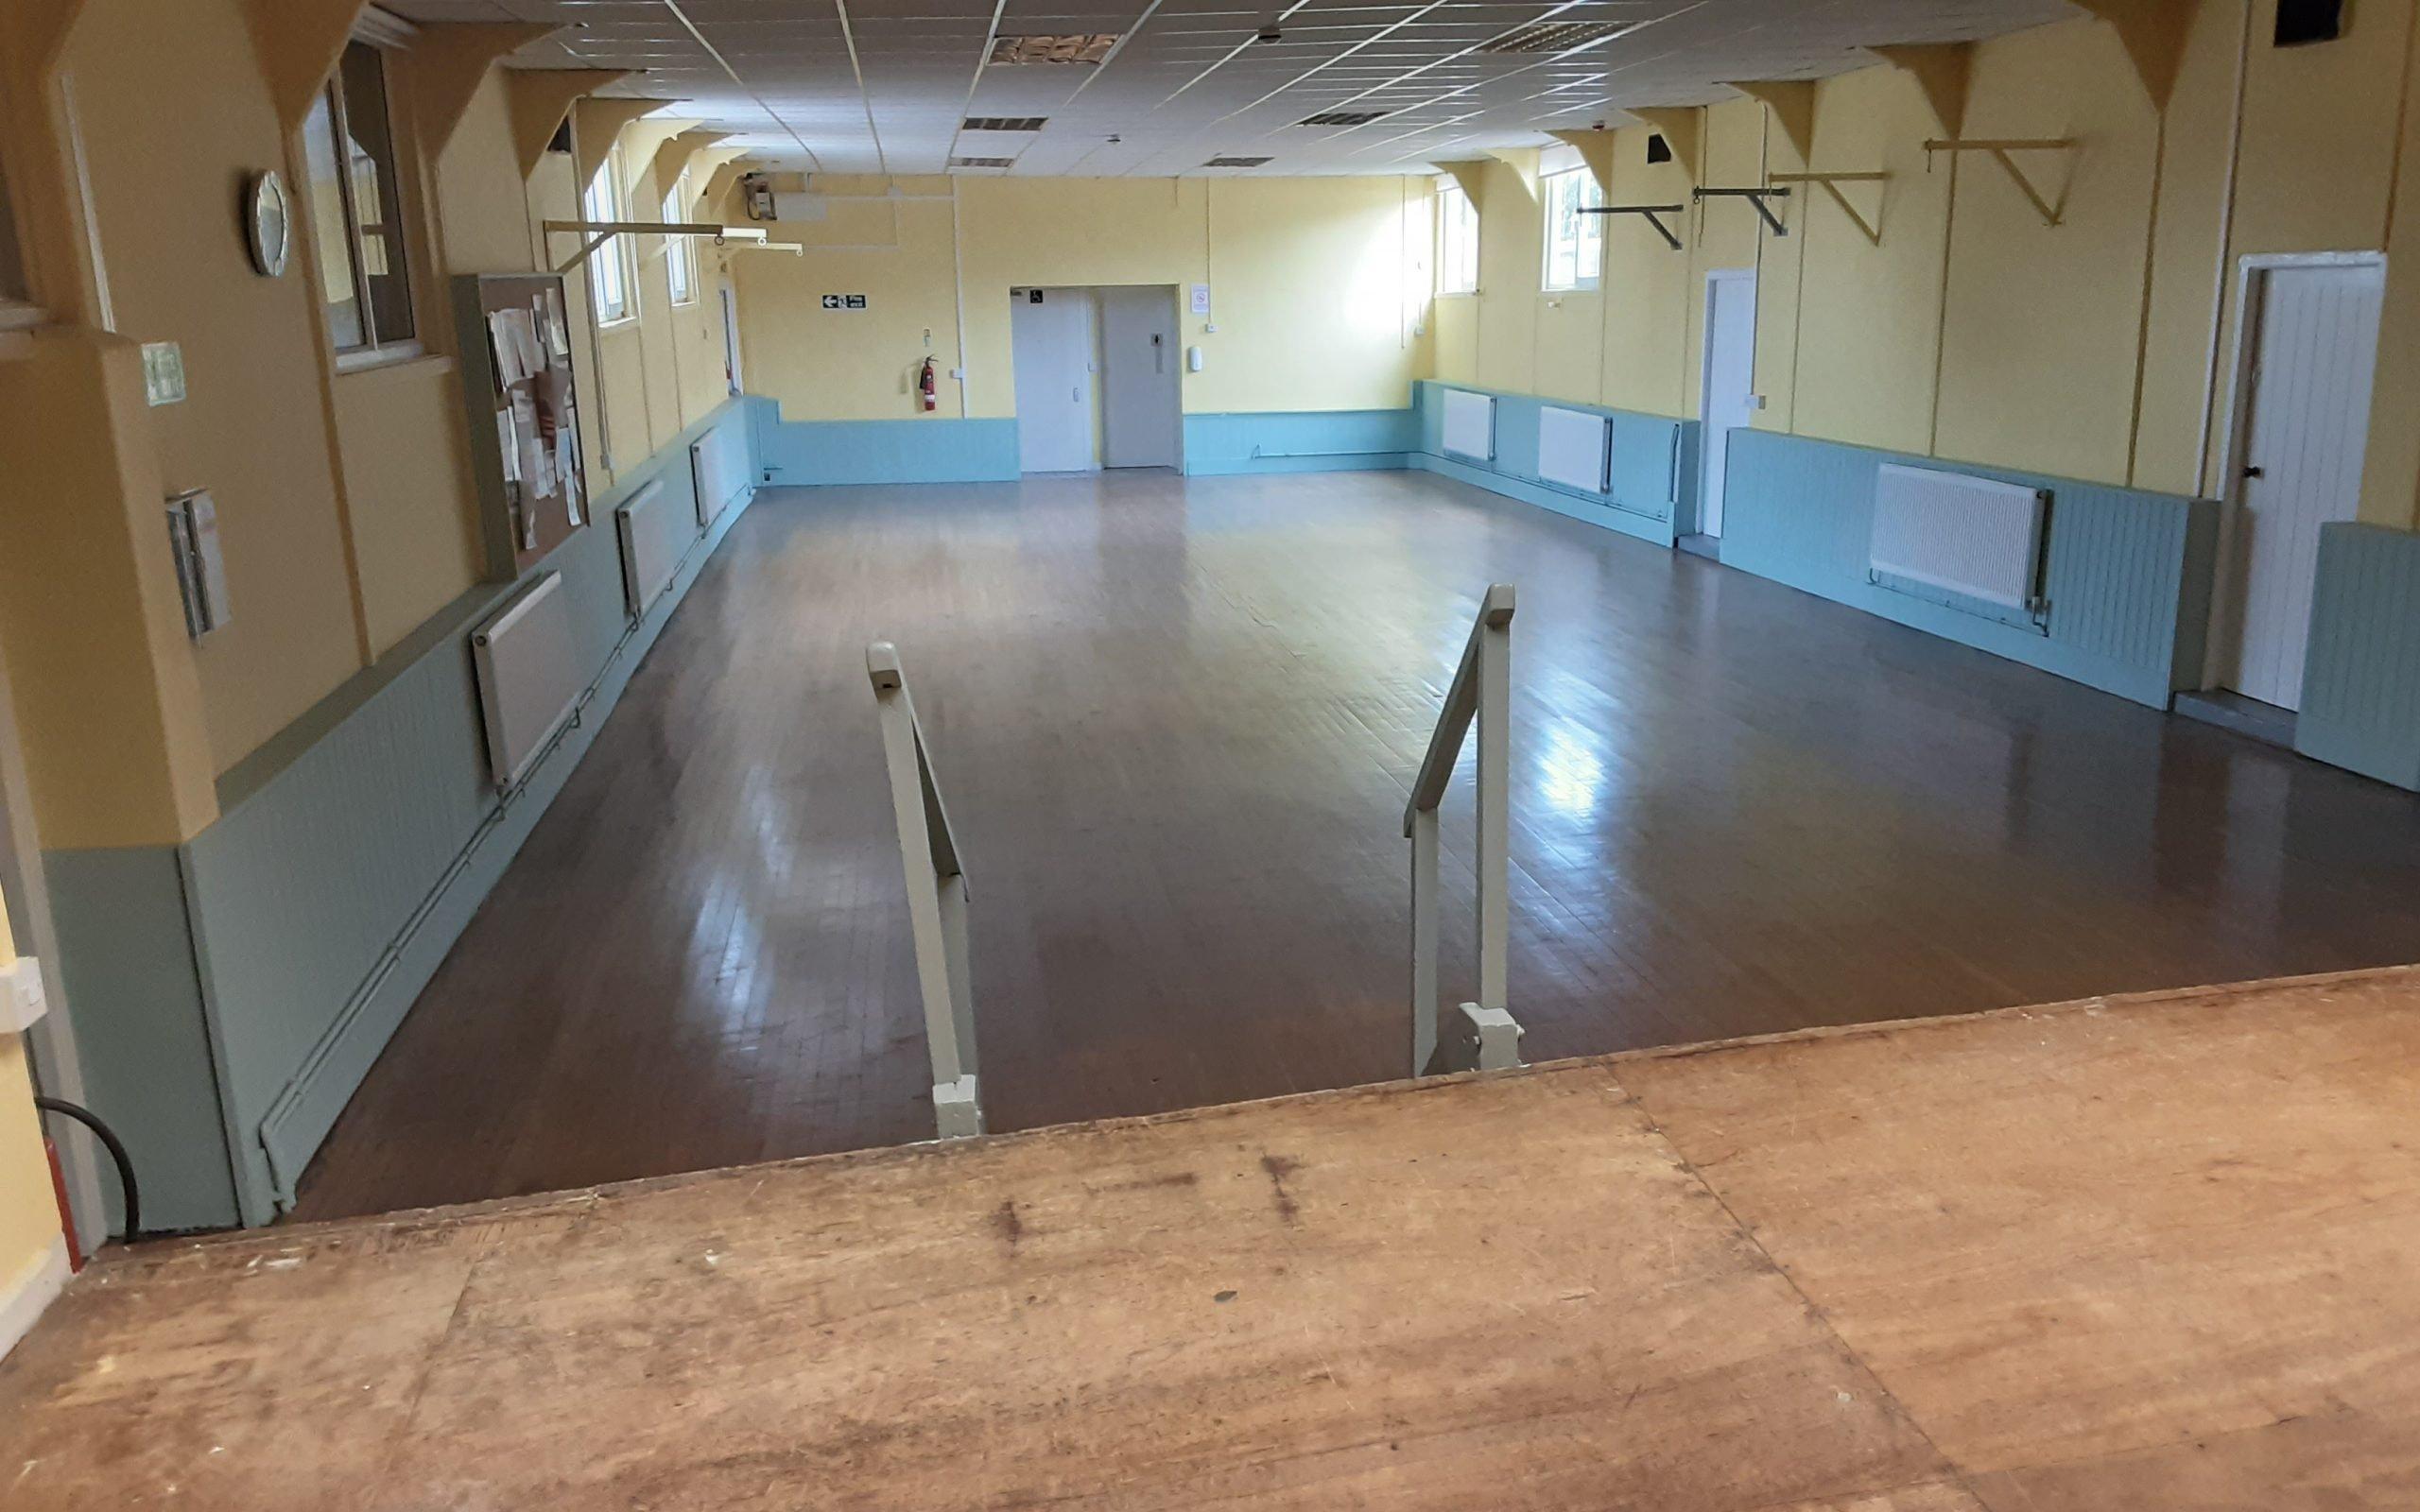 Cornelly Public Hall